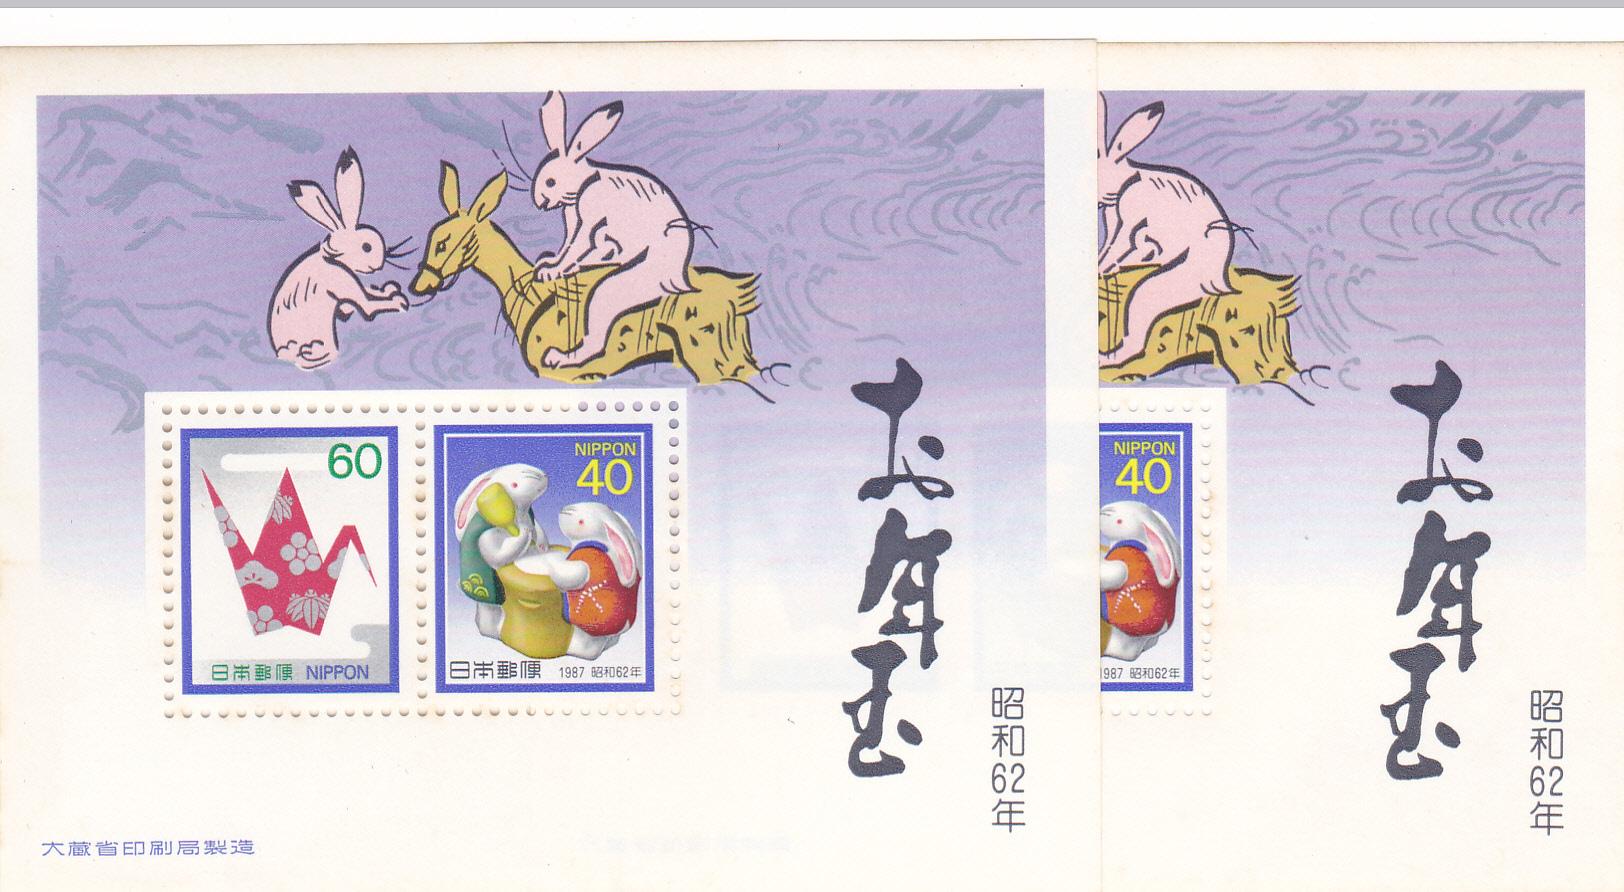 1987IMG_0004.jpg